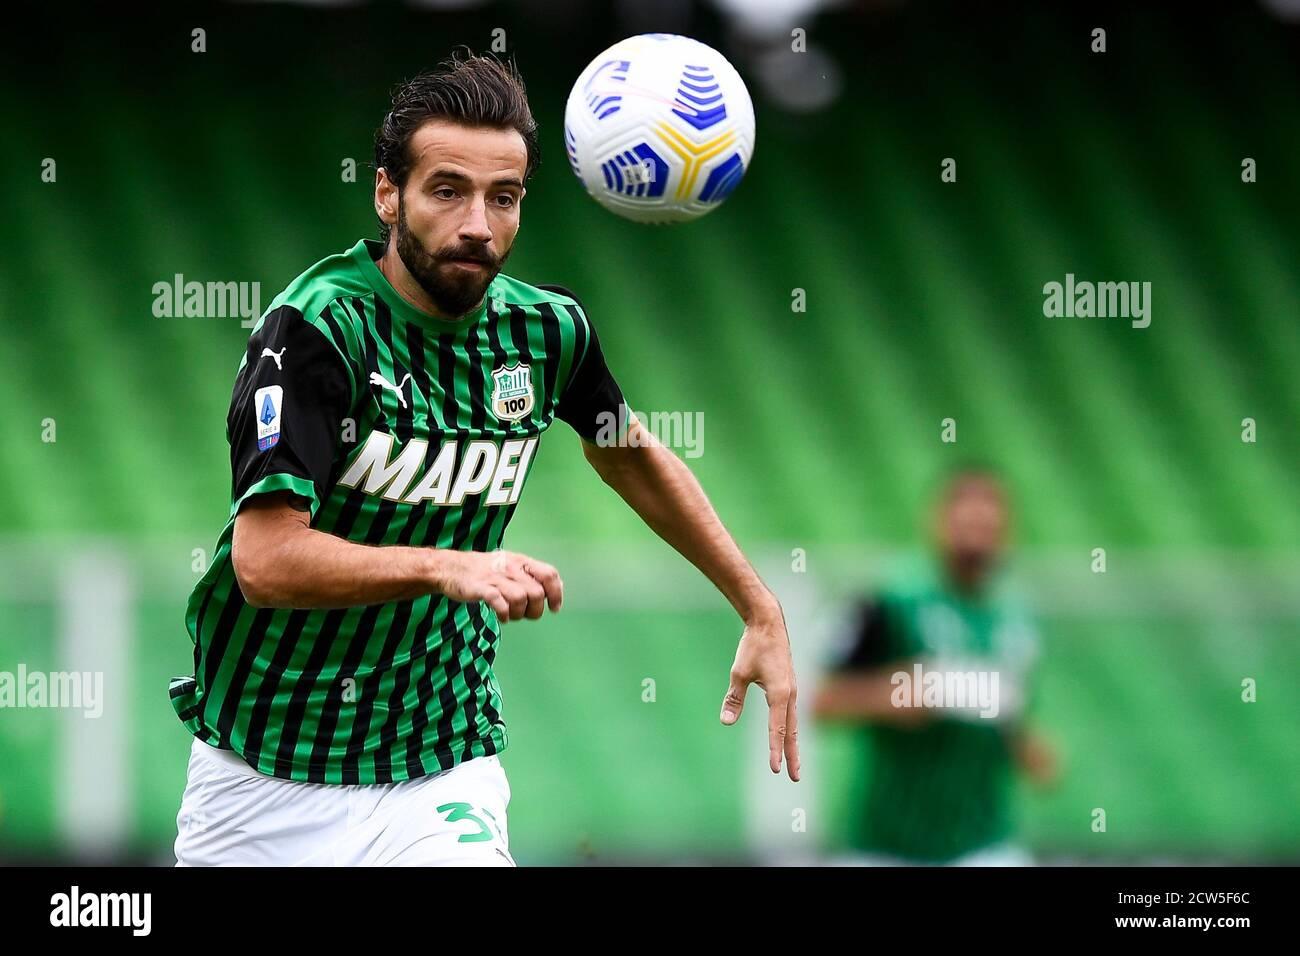 Cesena Italy 27th Sep 2020 Cesena Italy September 27 2020 Gian Marco Ferrari Of Us Sassuolo